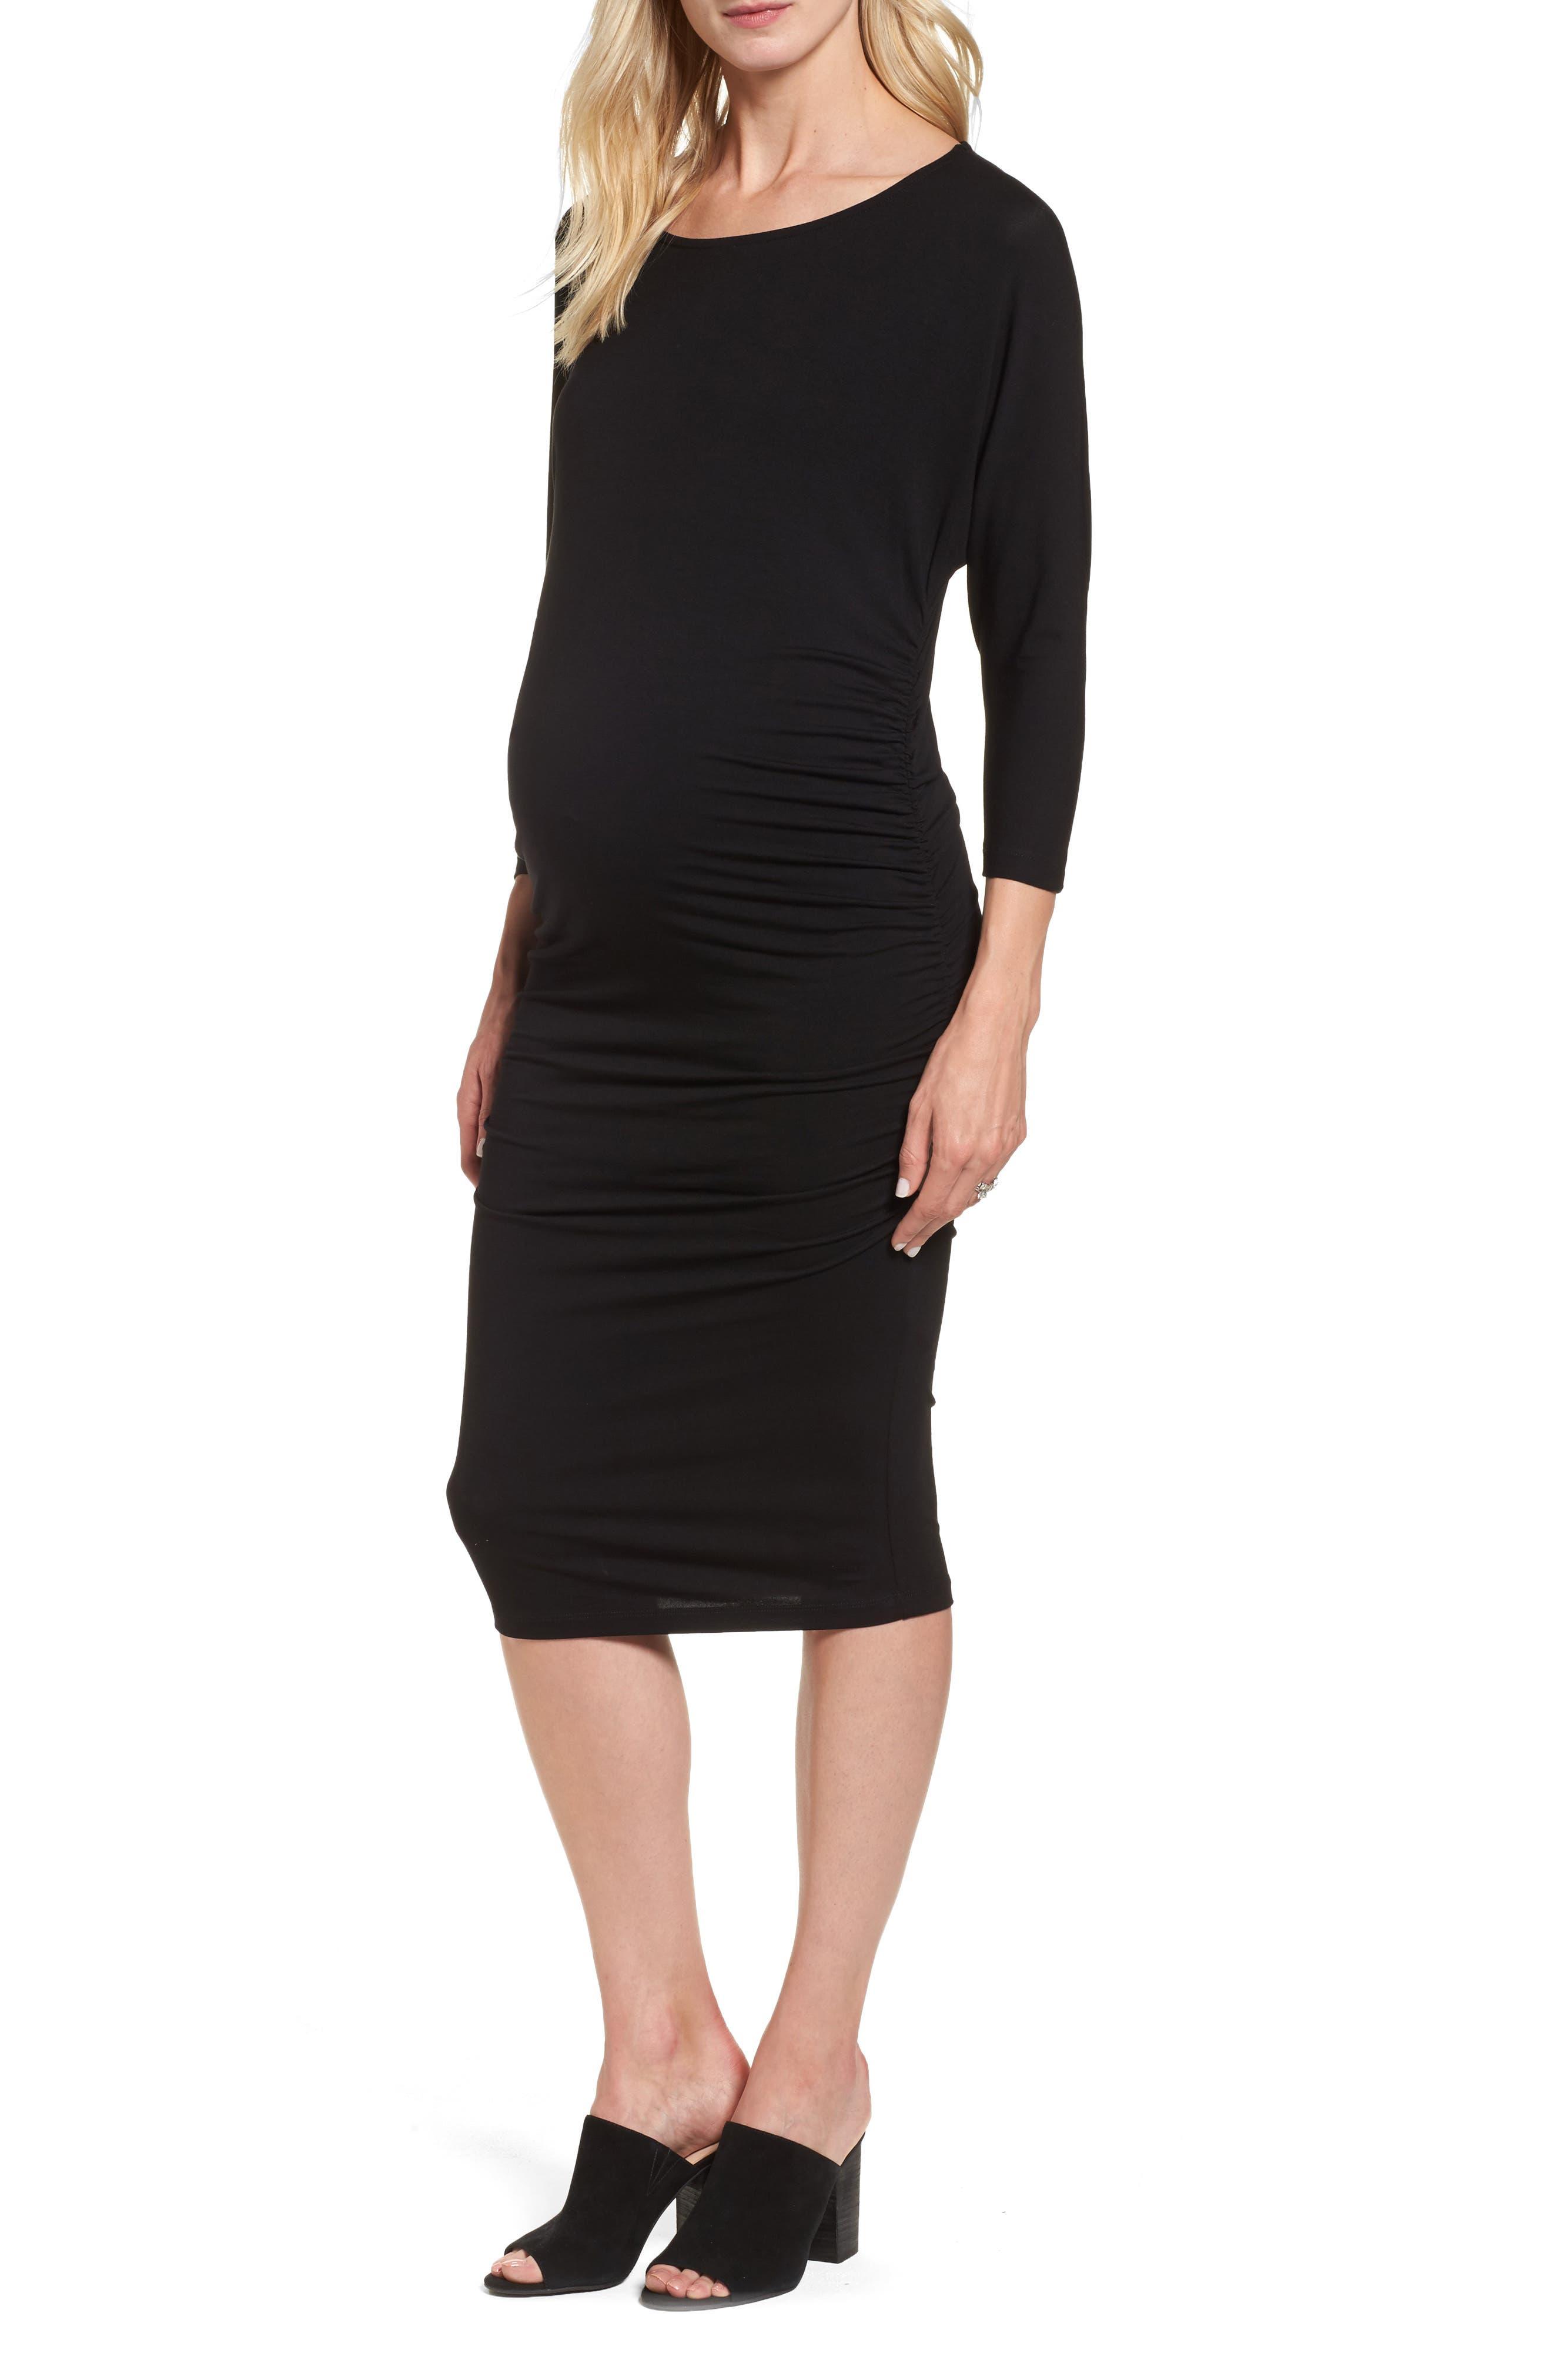 Jessa Maternity Dress,                         Main,                         color, Caviar Black